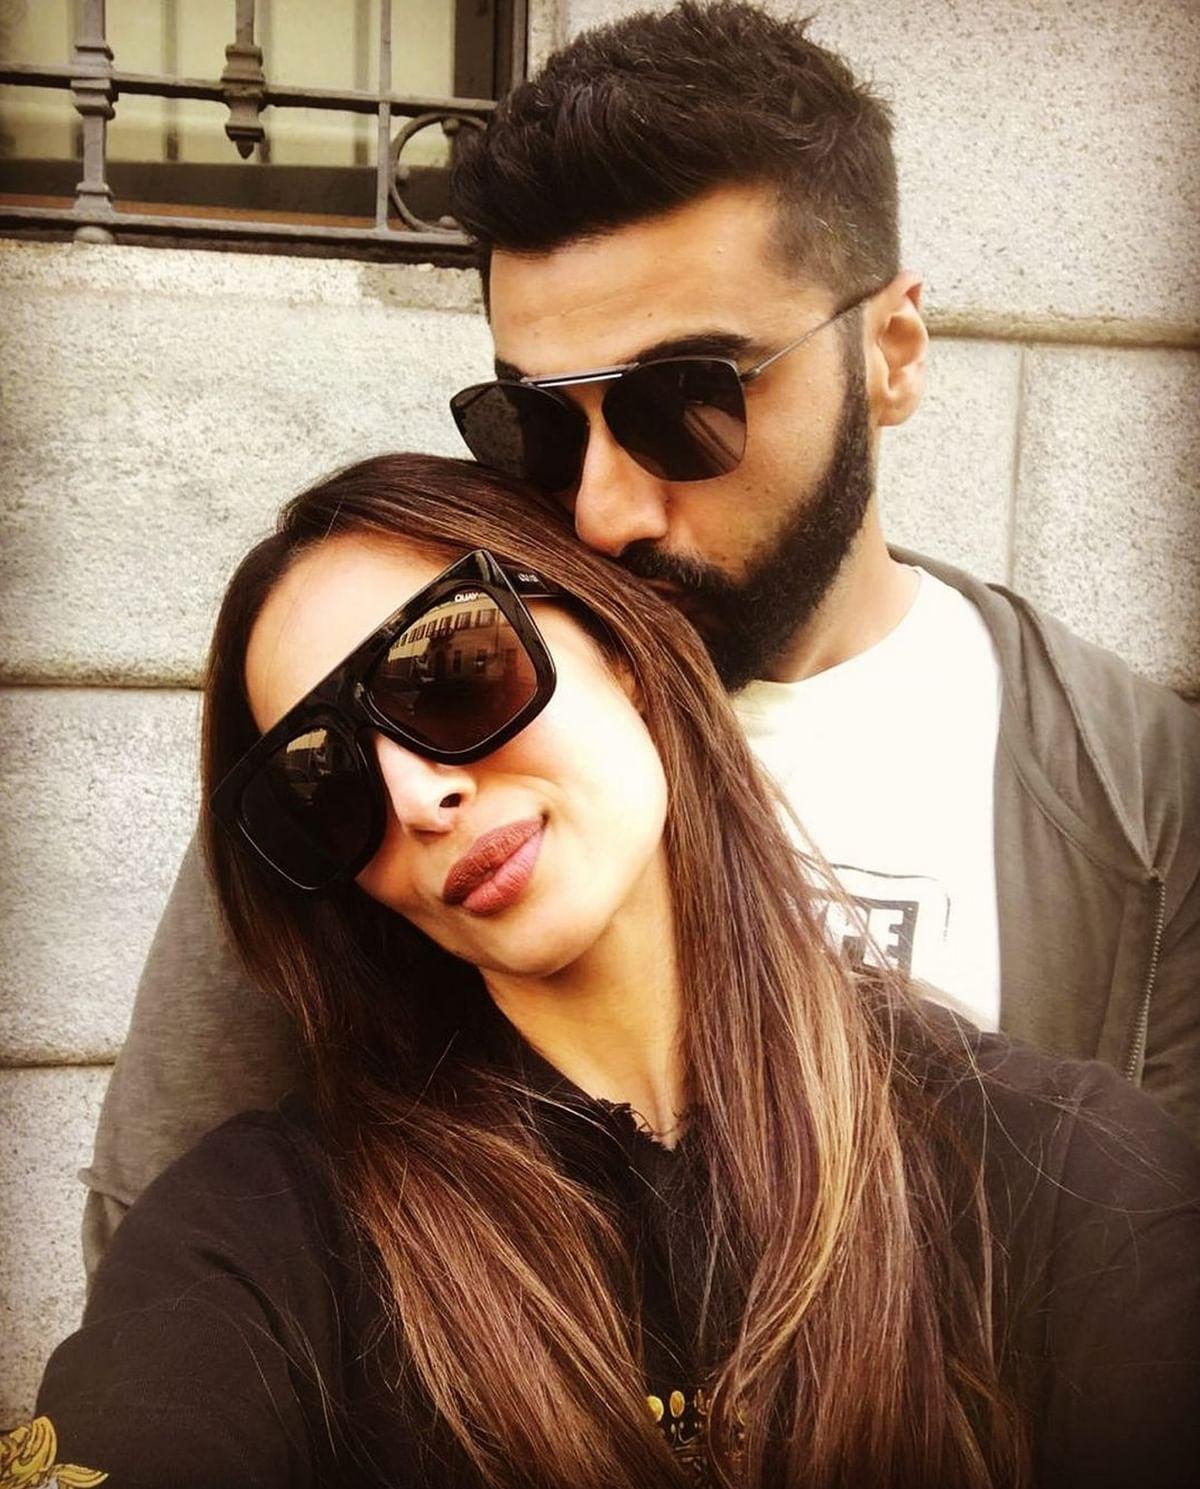 Arjun Kapoor and Malaika Arora sharing a sweet moment